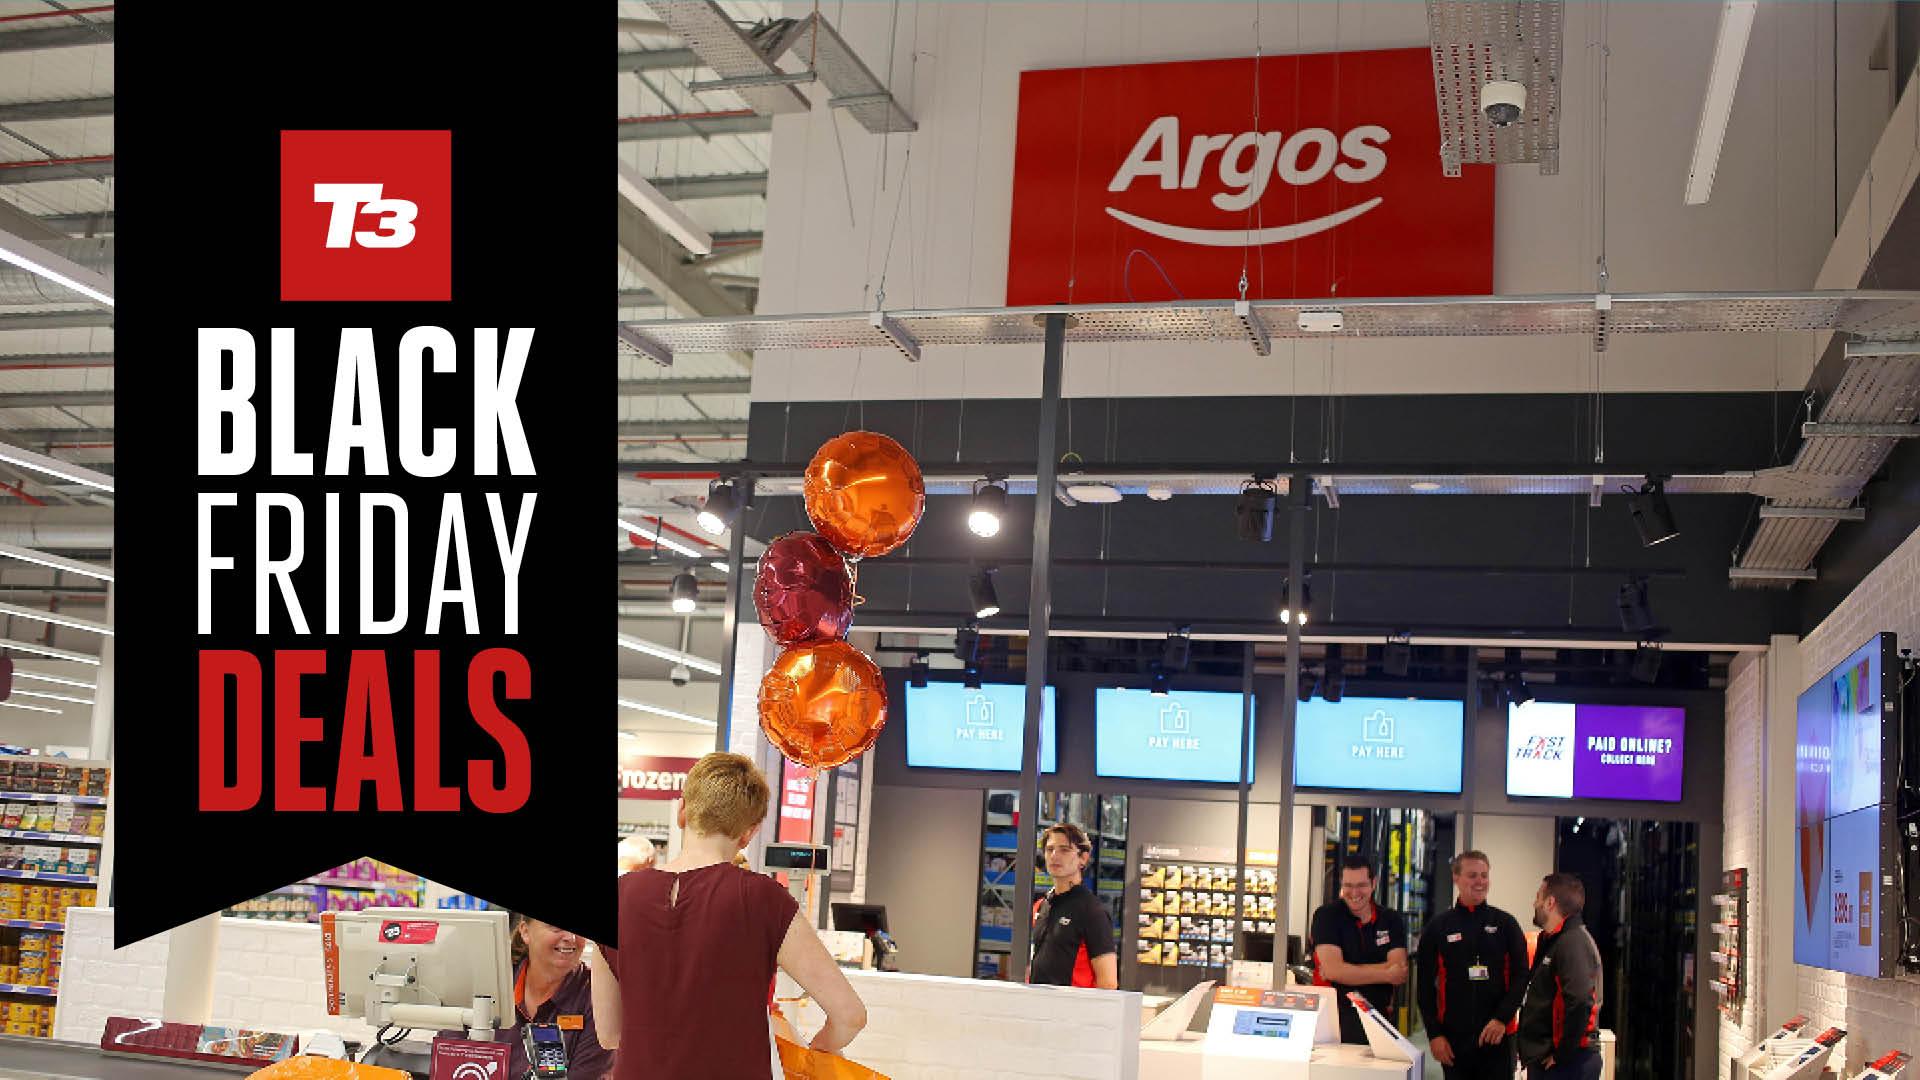 Best Argos Black Friday Deals Cheap Dyson Shark Ipads Beats Headphones And Toys Galore T3